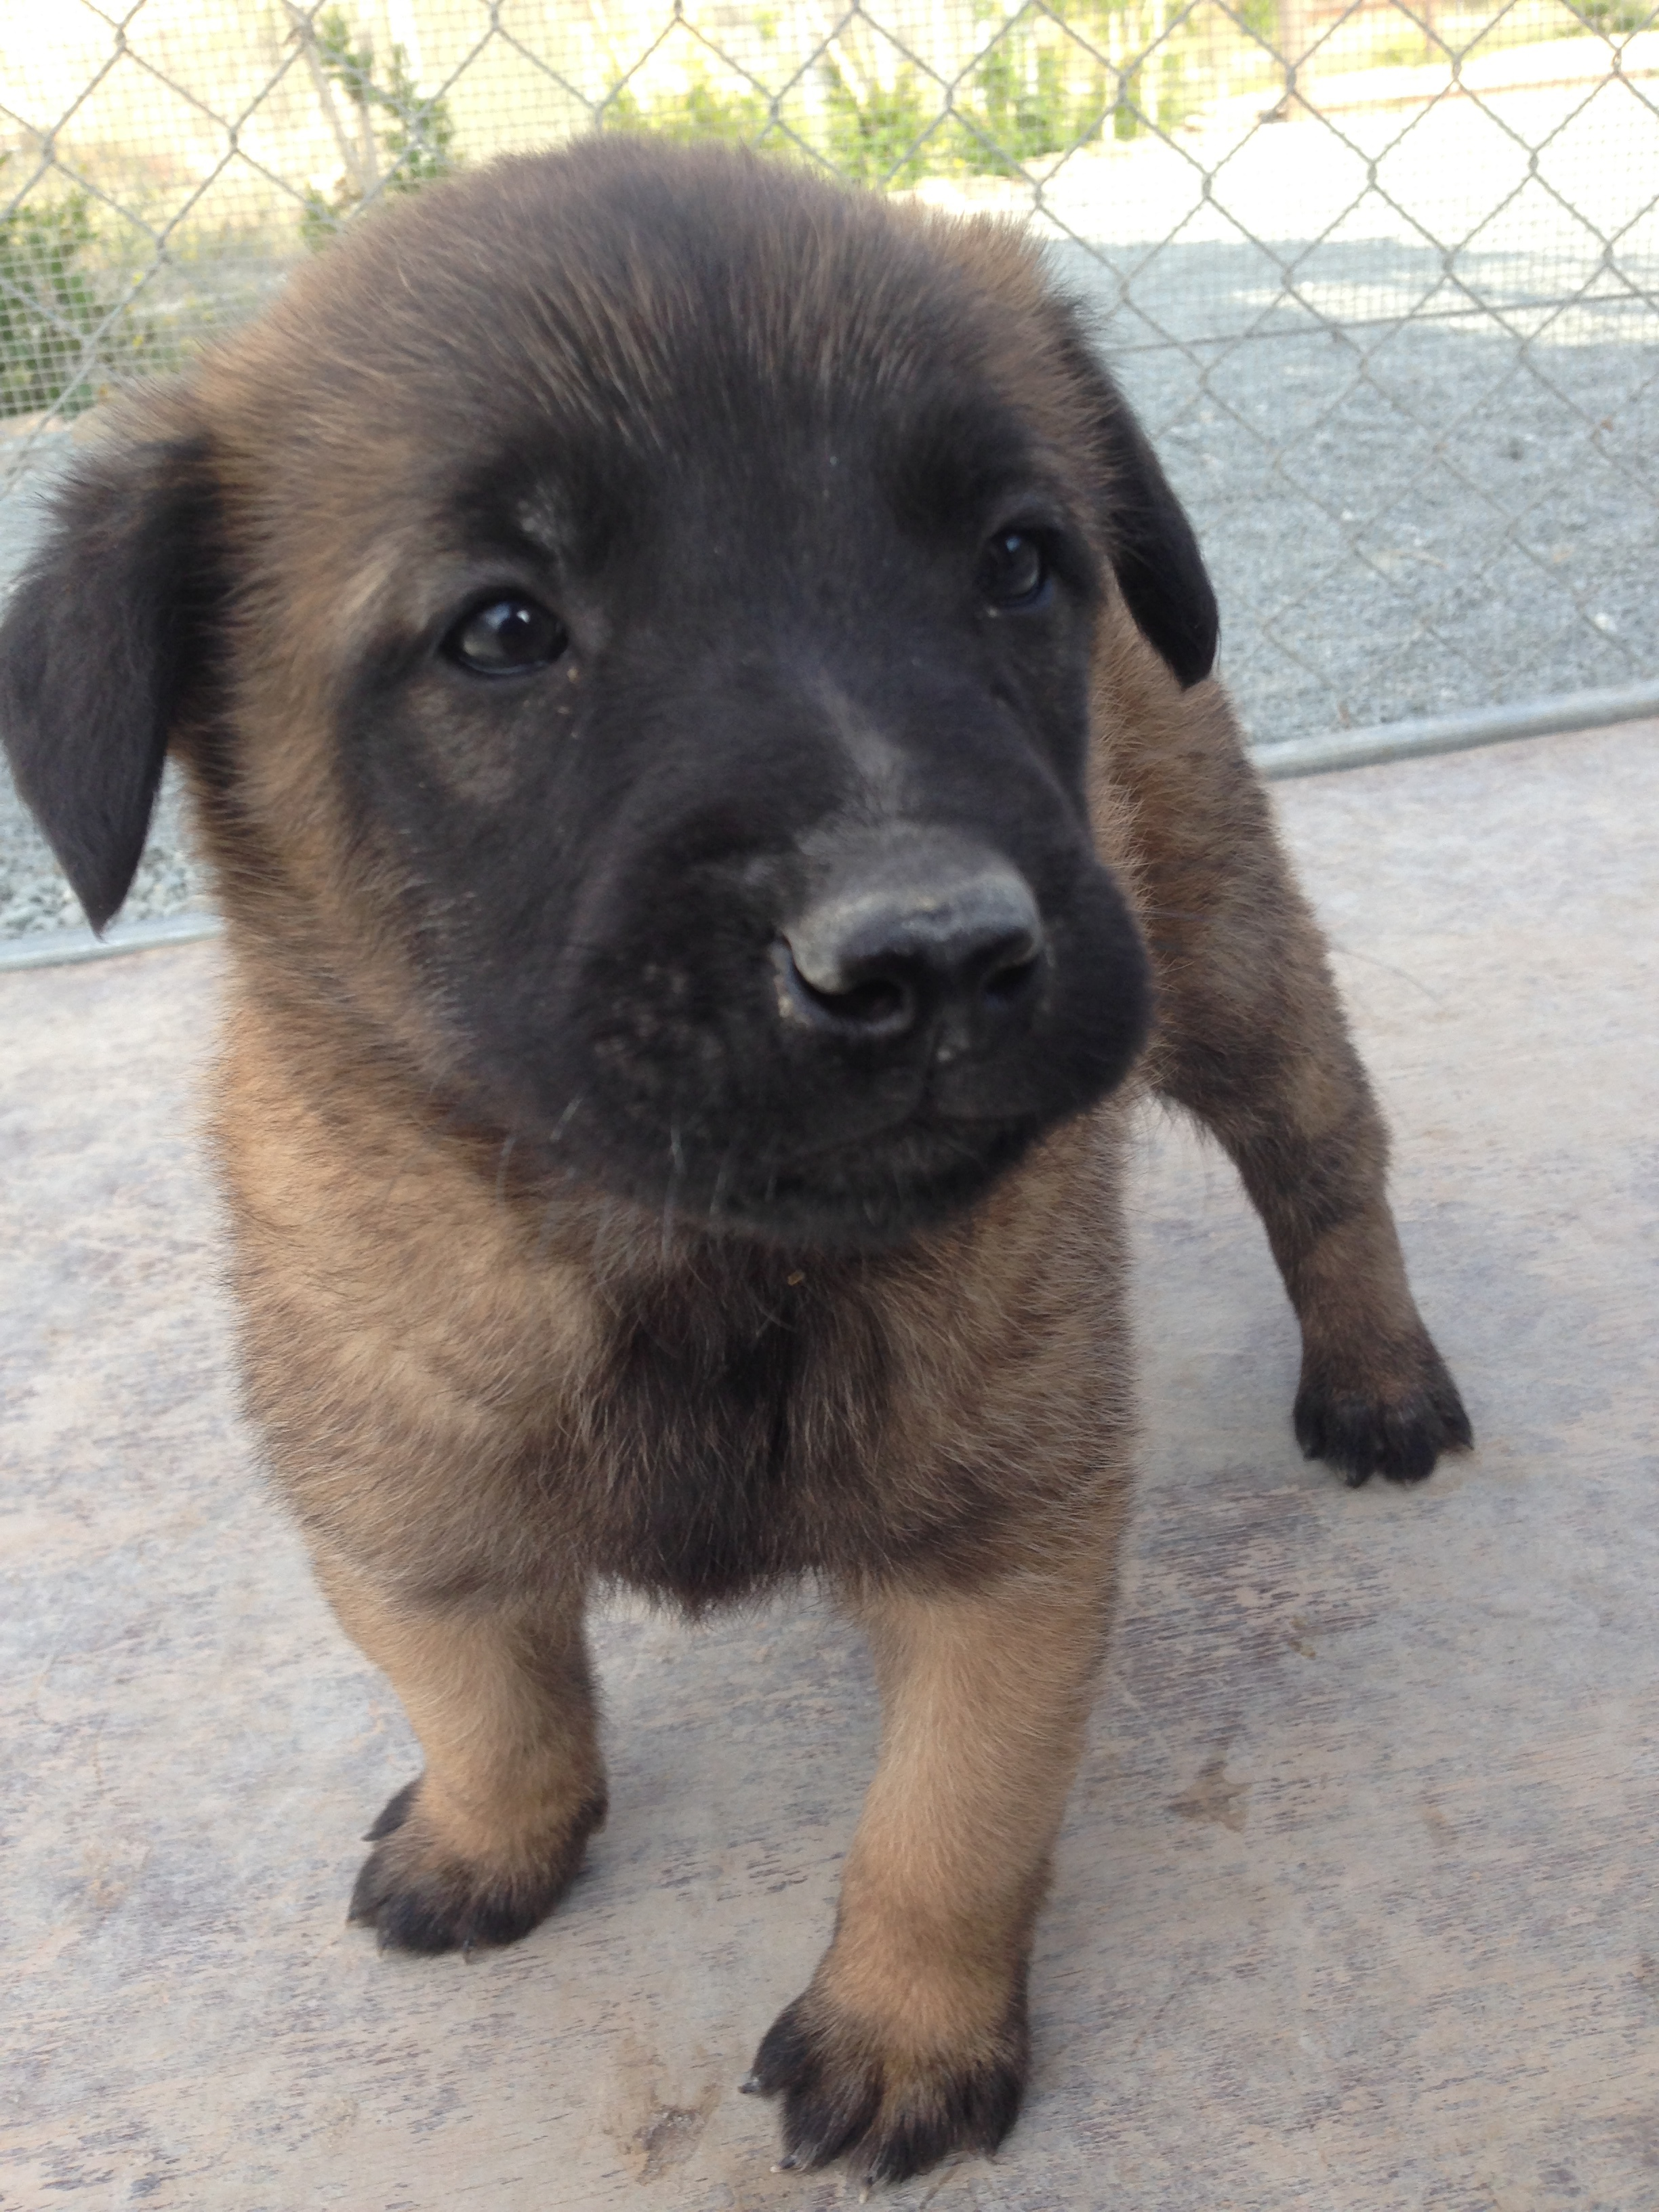 malinois_puppy_cyprus_dog_ranch_28.JPG